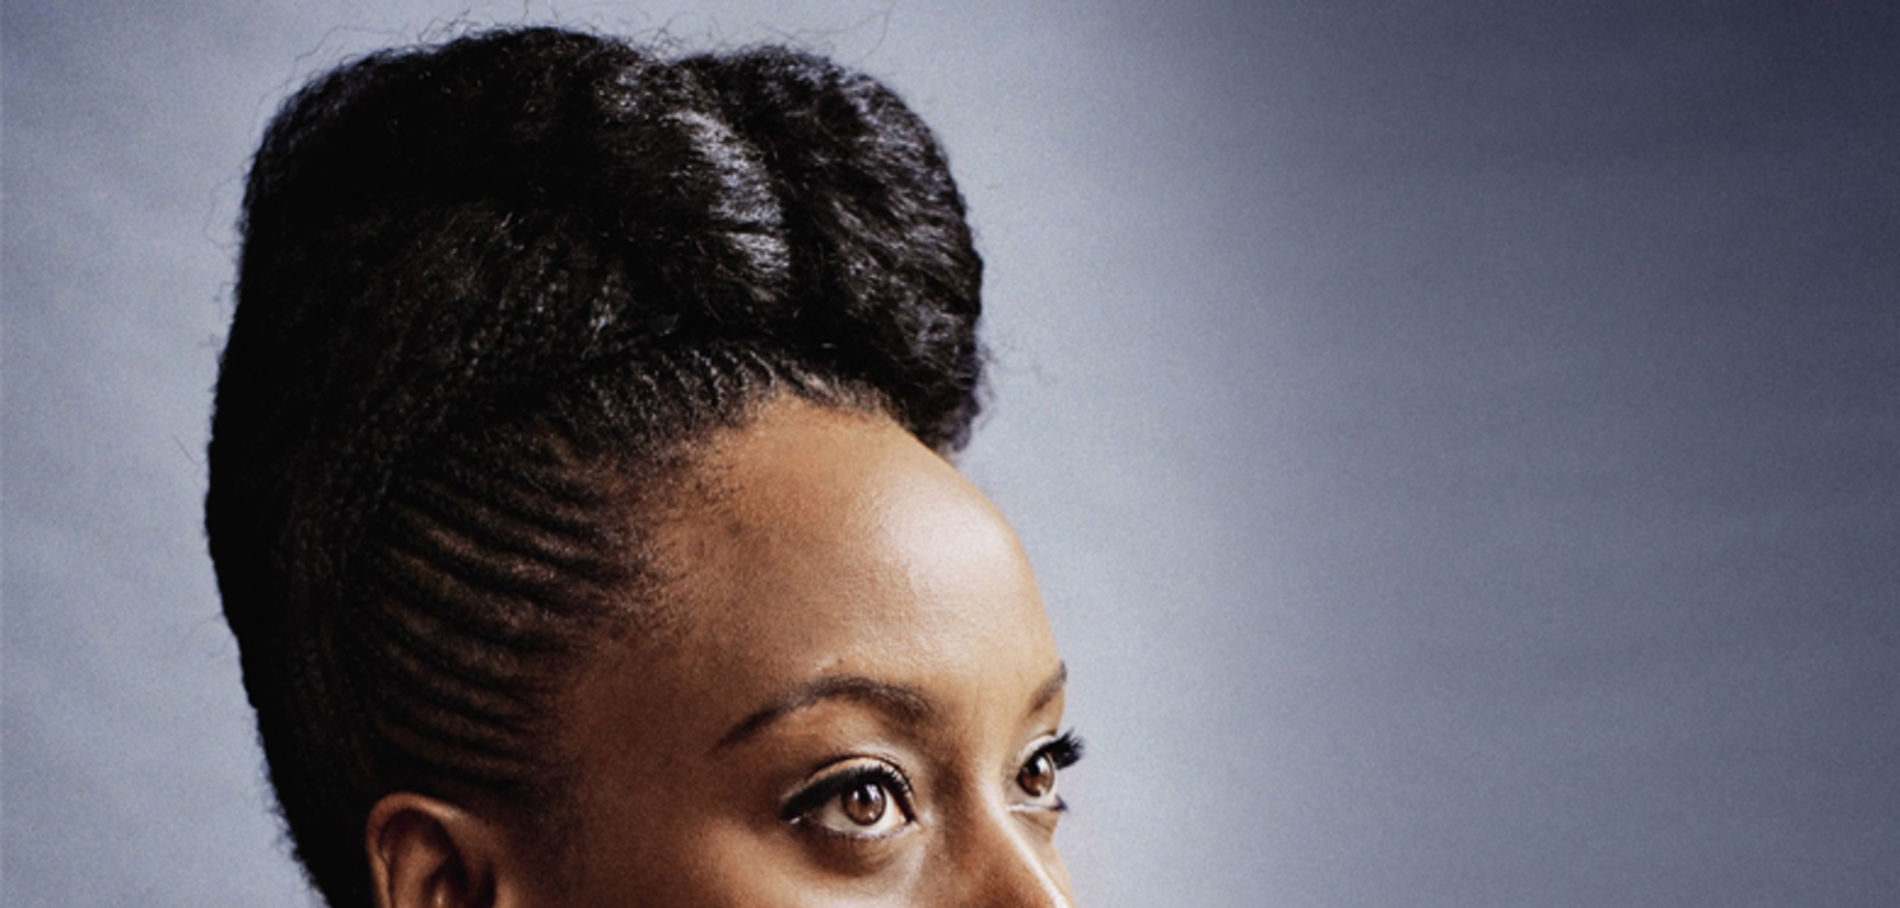 Chimamanda-Ngozi-Adichie-l-ecrivain-qui-inspire-Beyonce_exact1900x908_l